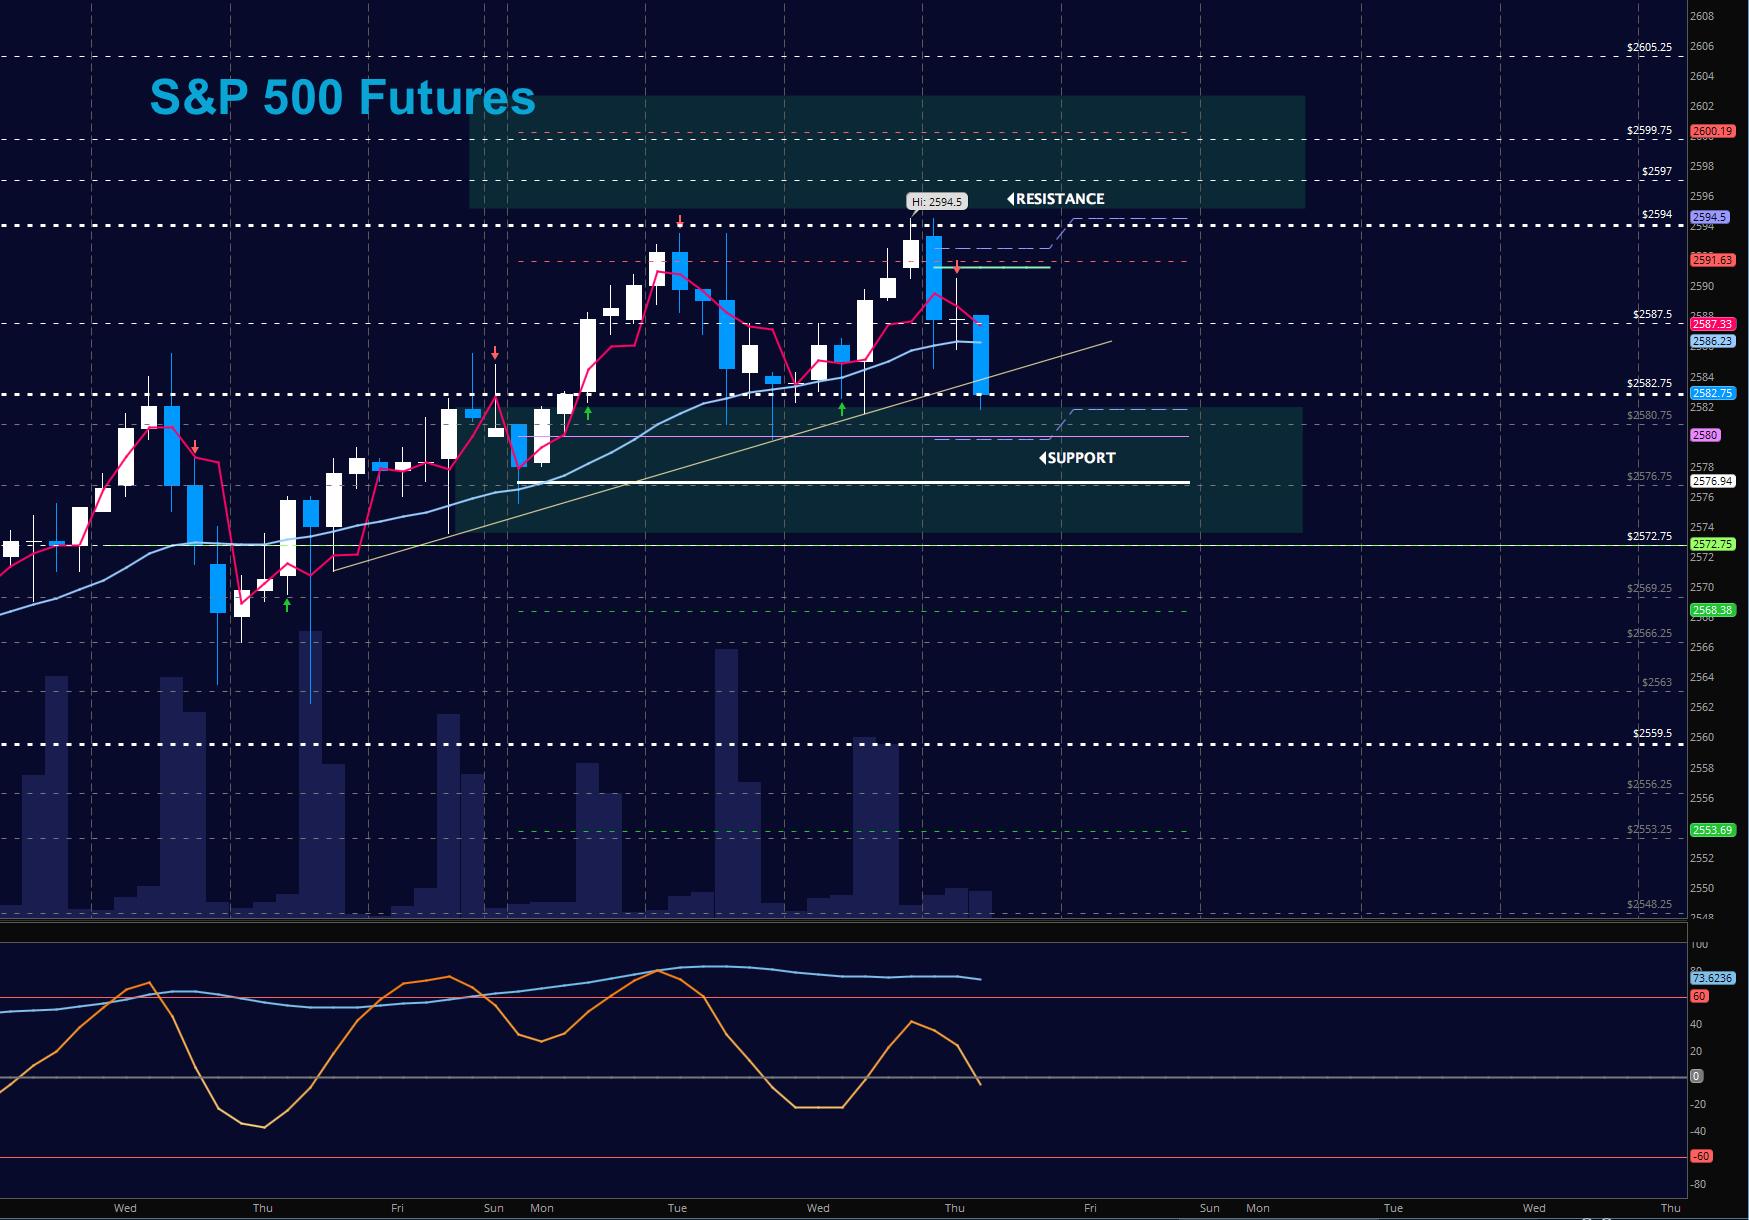 sp 500 futures stock market pullback chart trading analysis_november 9